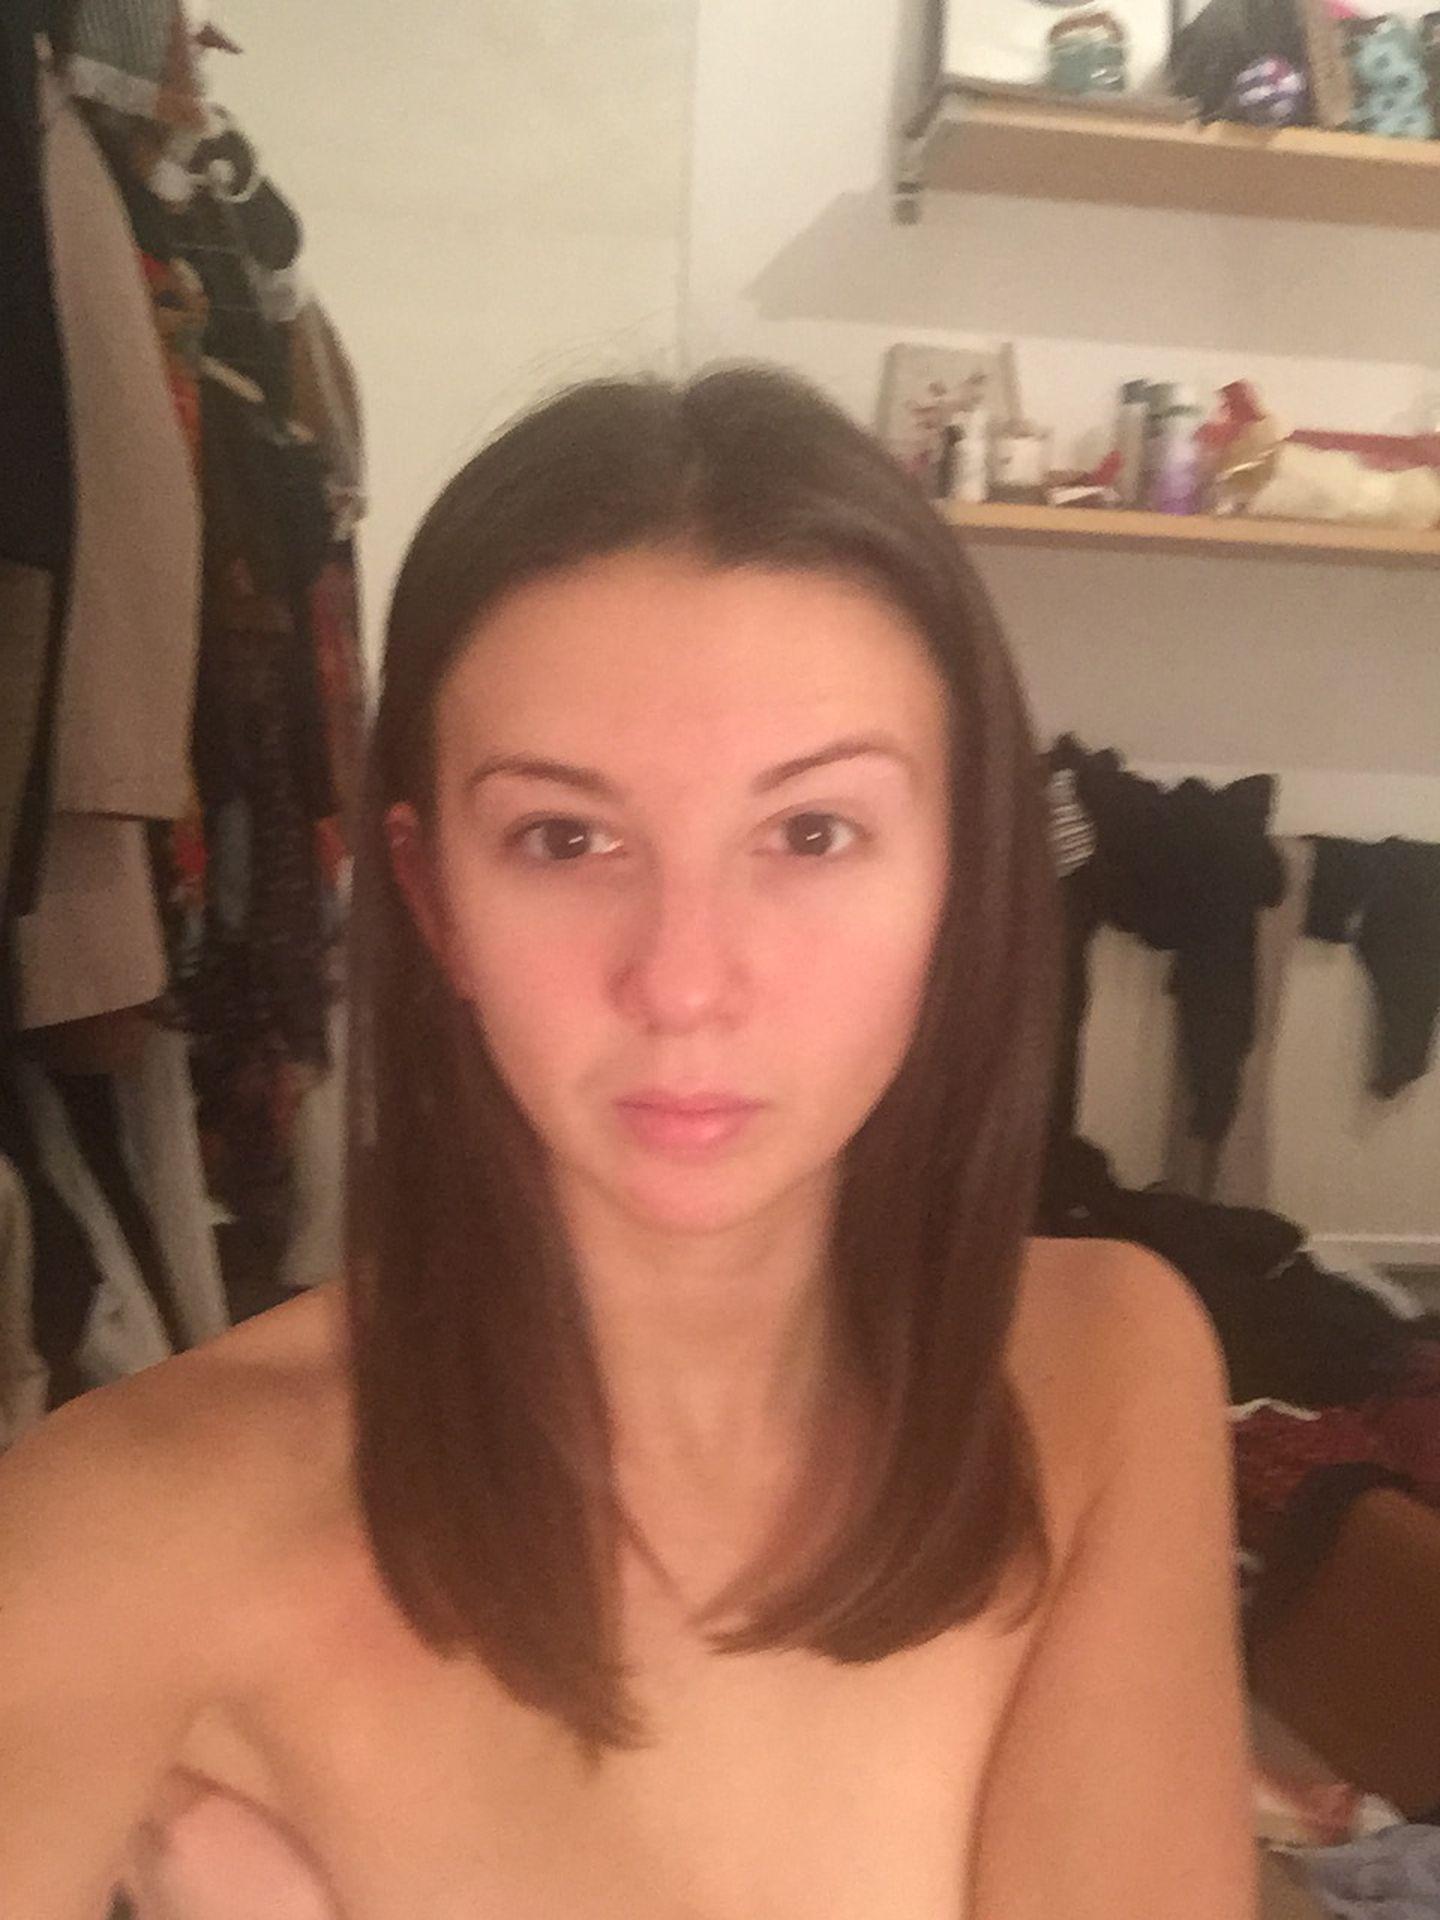 Zizi Strallen Nude Leaked The Fappening 0006